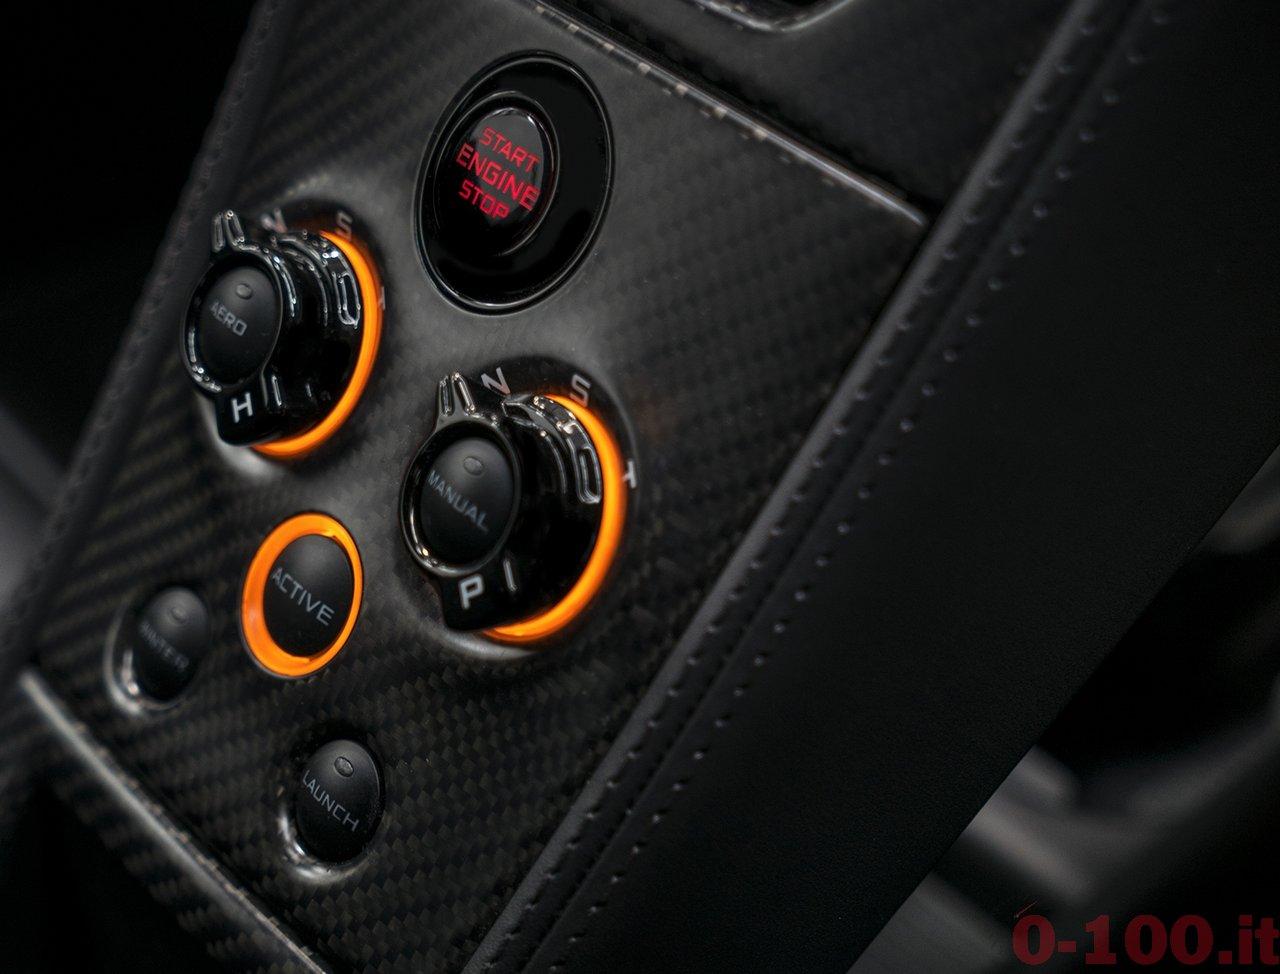 mclaren-special-operations-mclaren-650s-coupe-concept_0-100_3